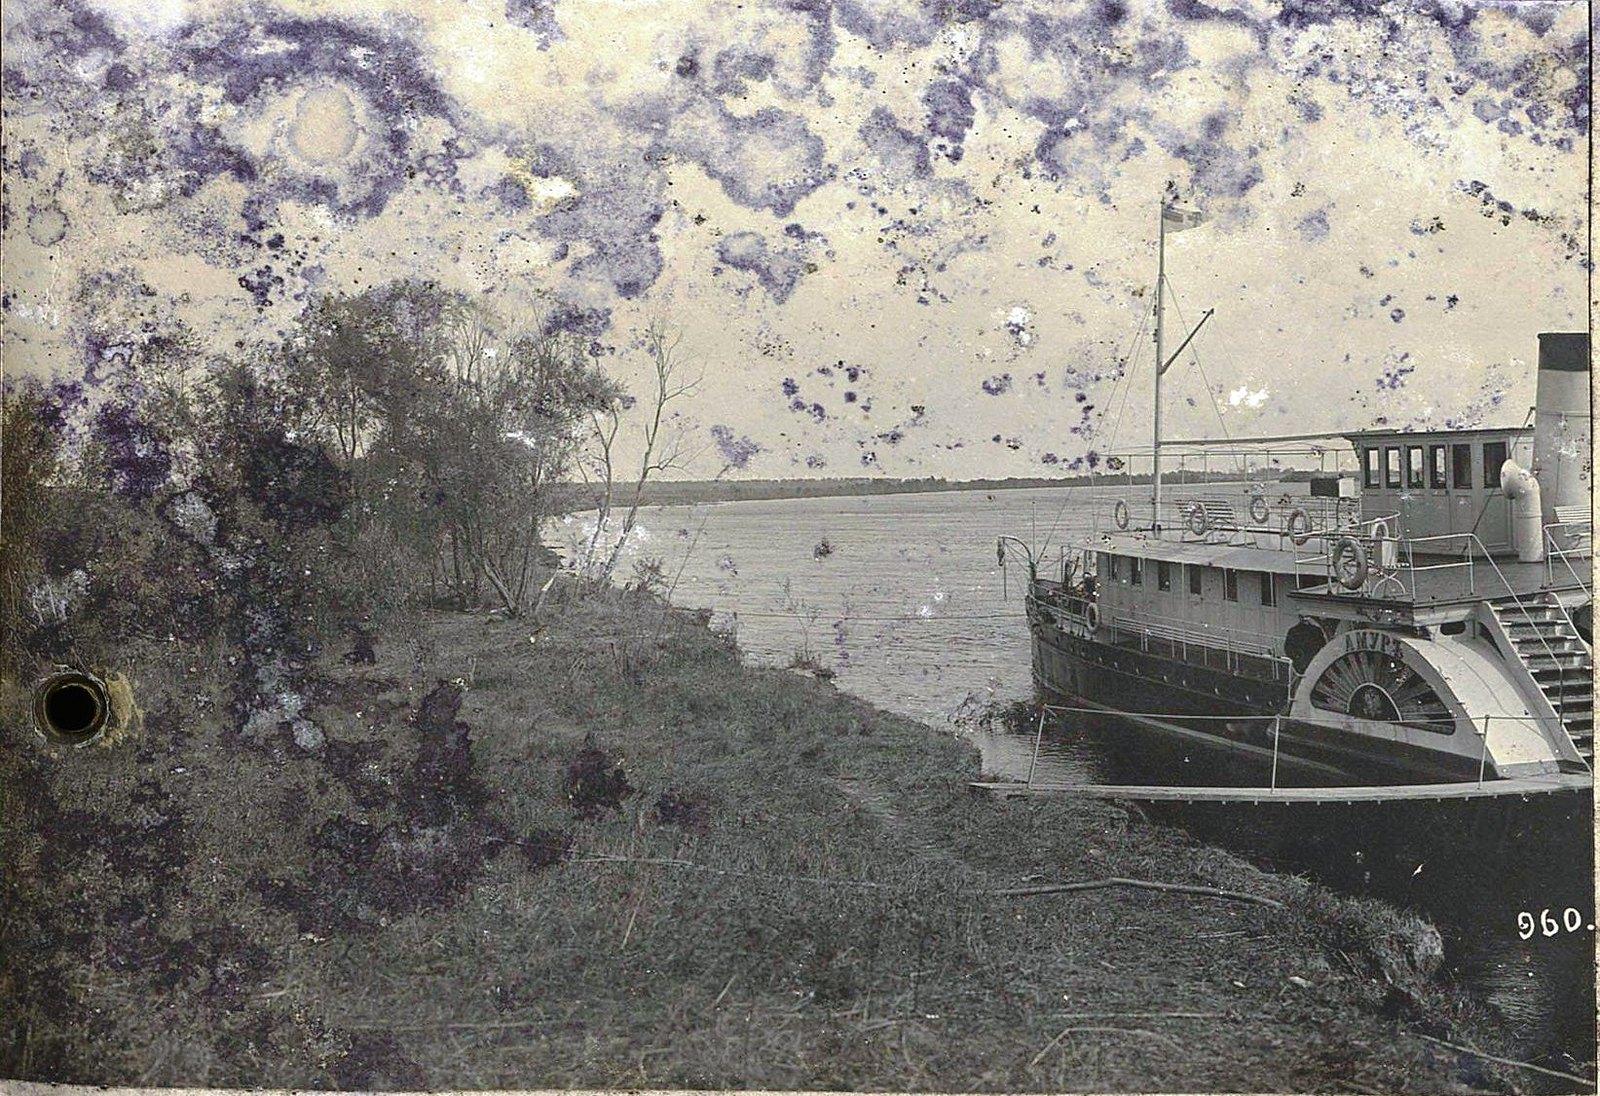 960. Корабль «Амур» у берега